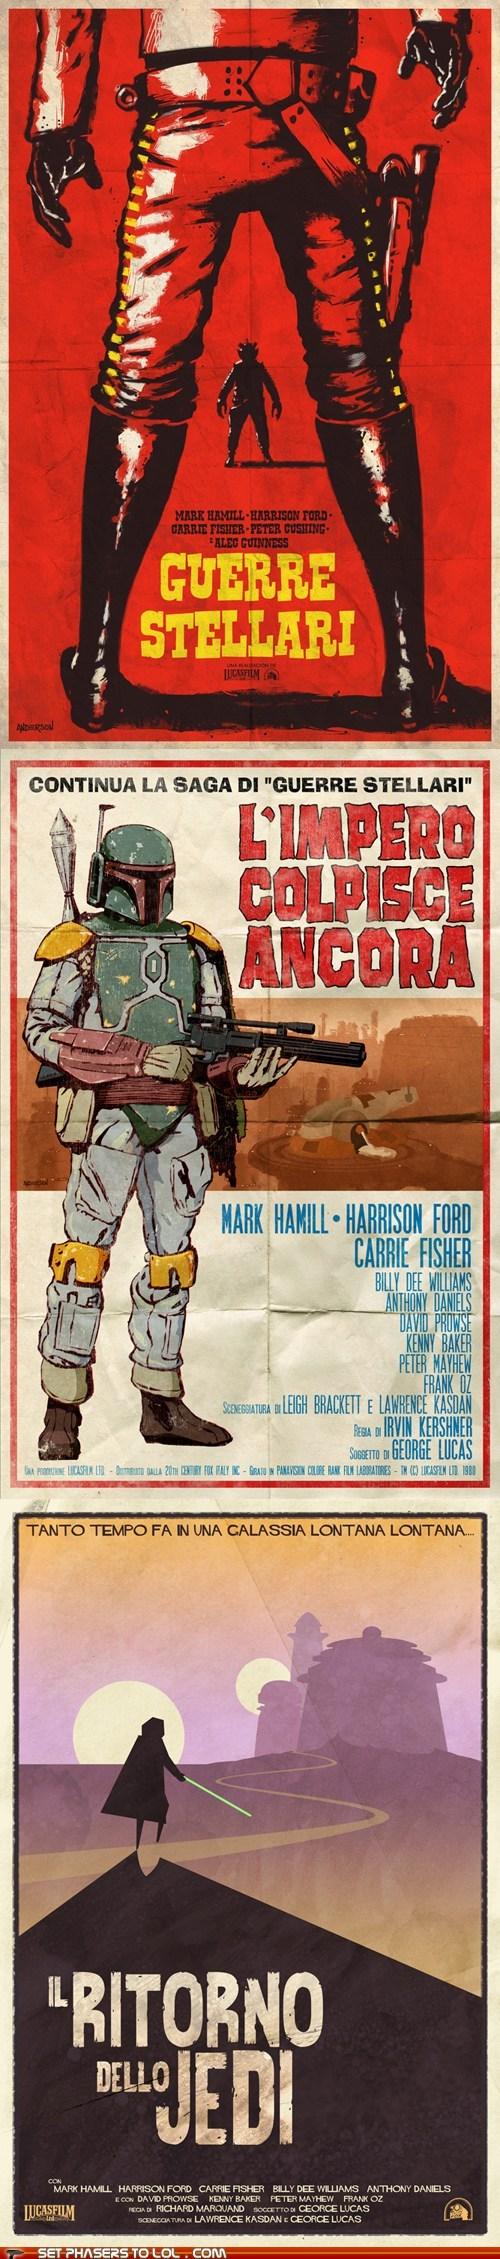 boba fett,italian,poster,return of the jedi,spaghetti western,star wars,The Empire Strikes Back